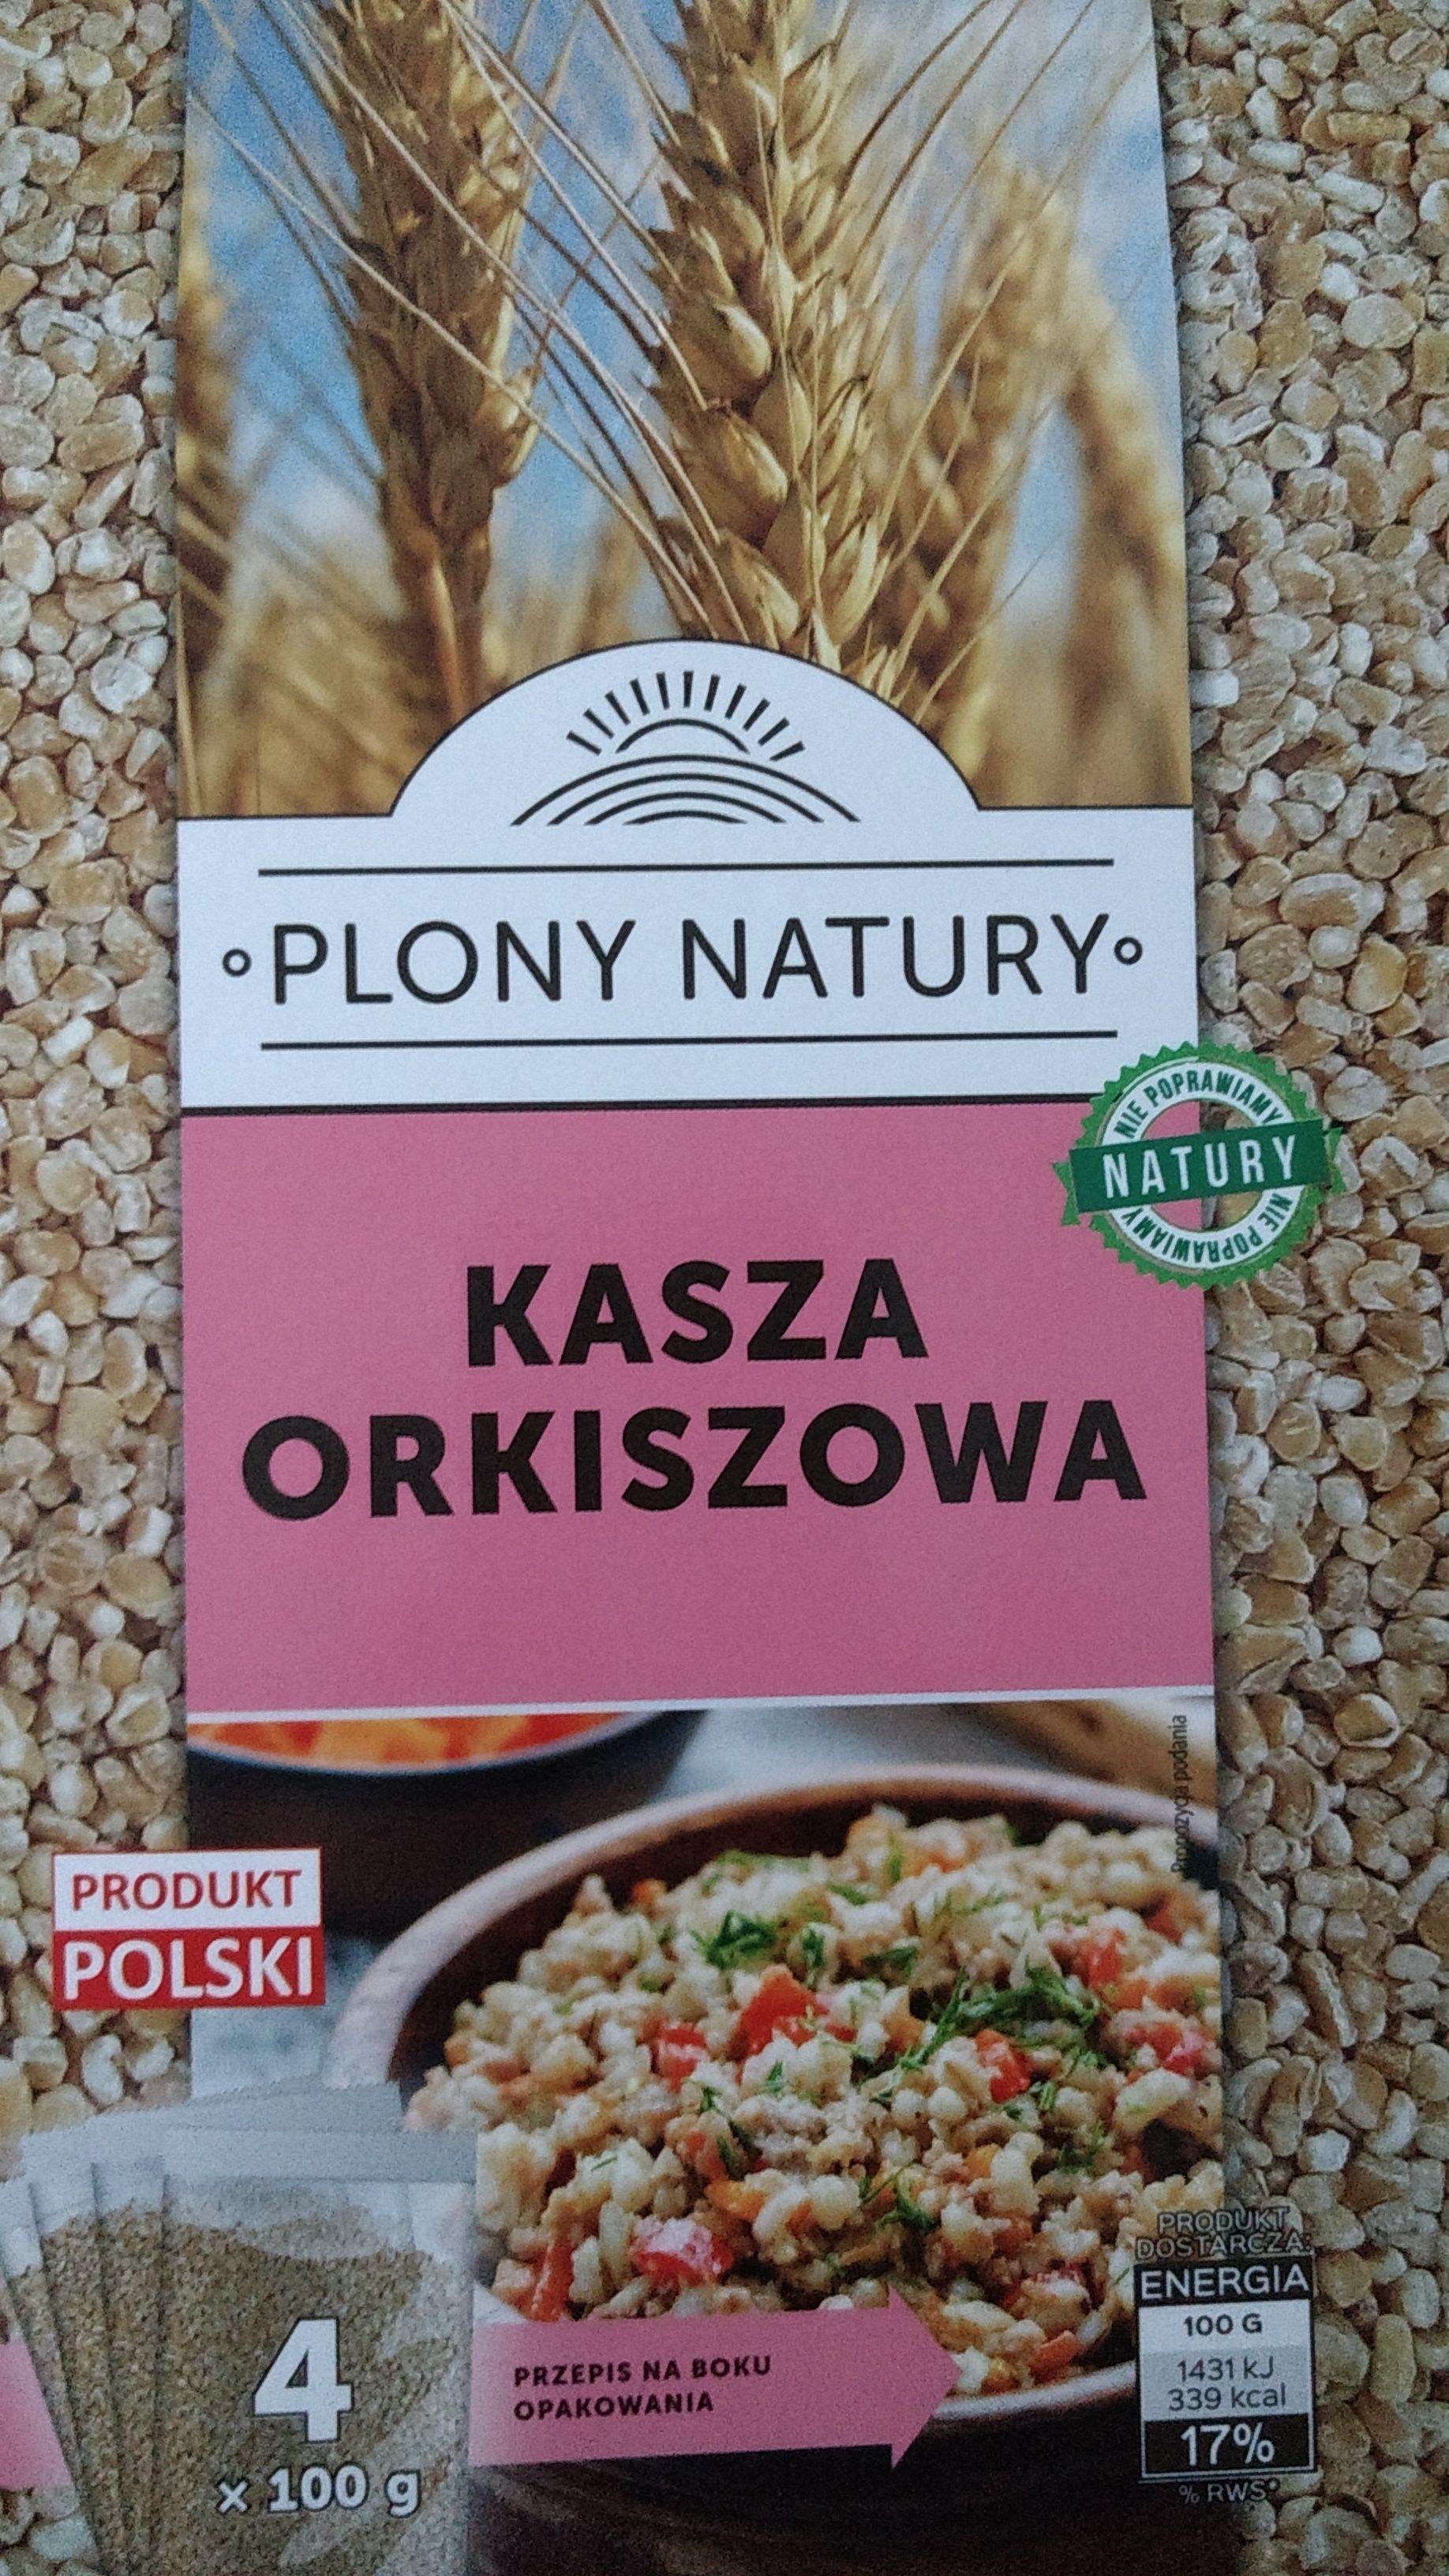 Kasza orkiszowa 4 x 100g @Biedronka